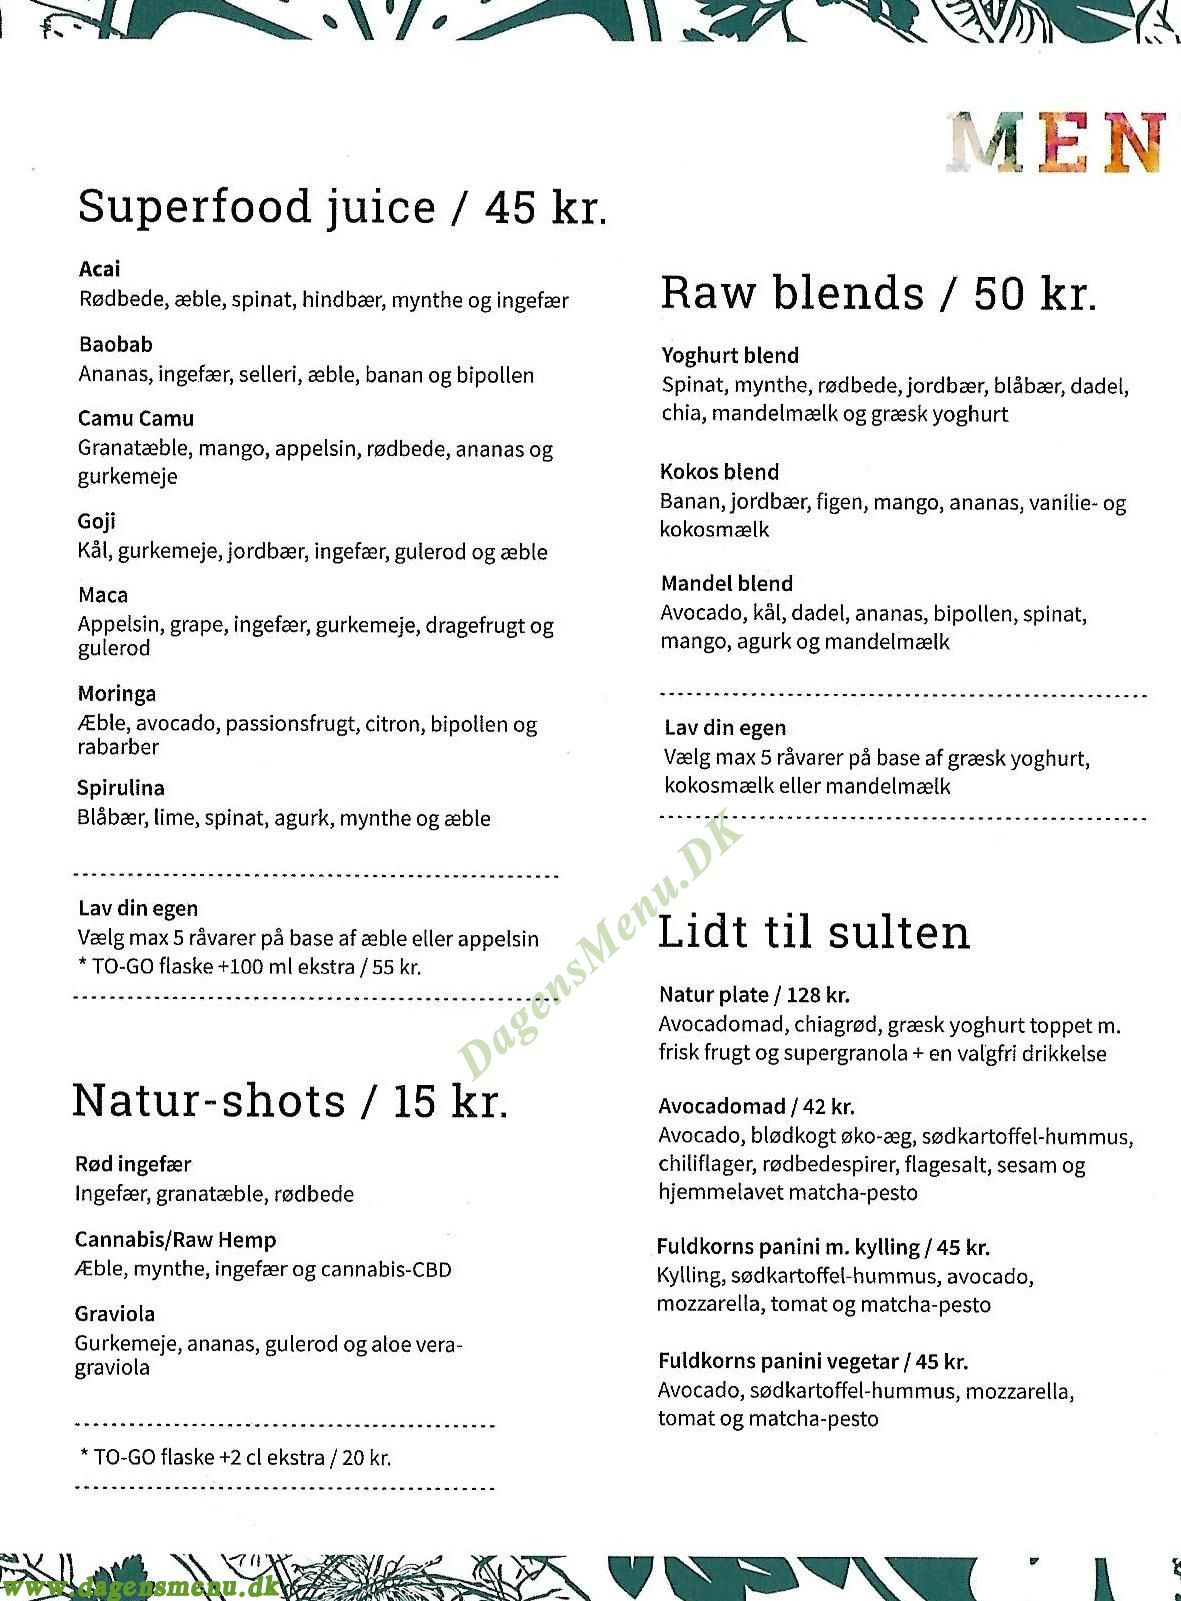 Natur Tørst Amager - Menukort